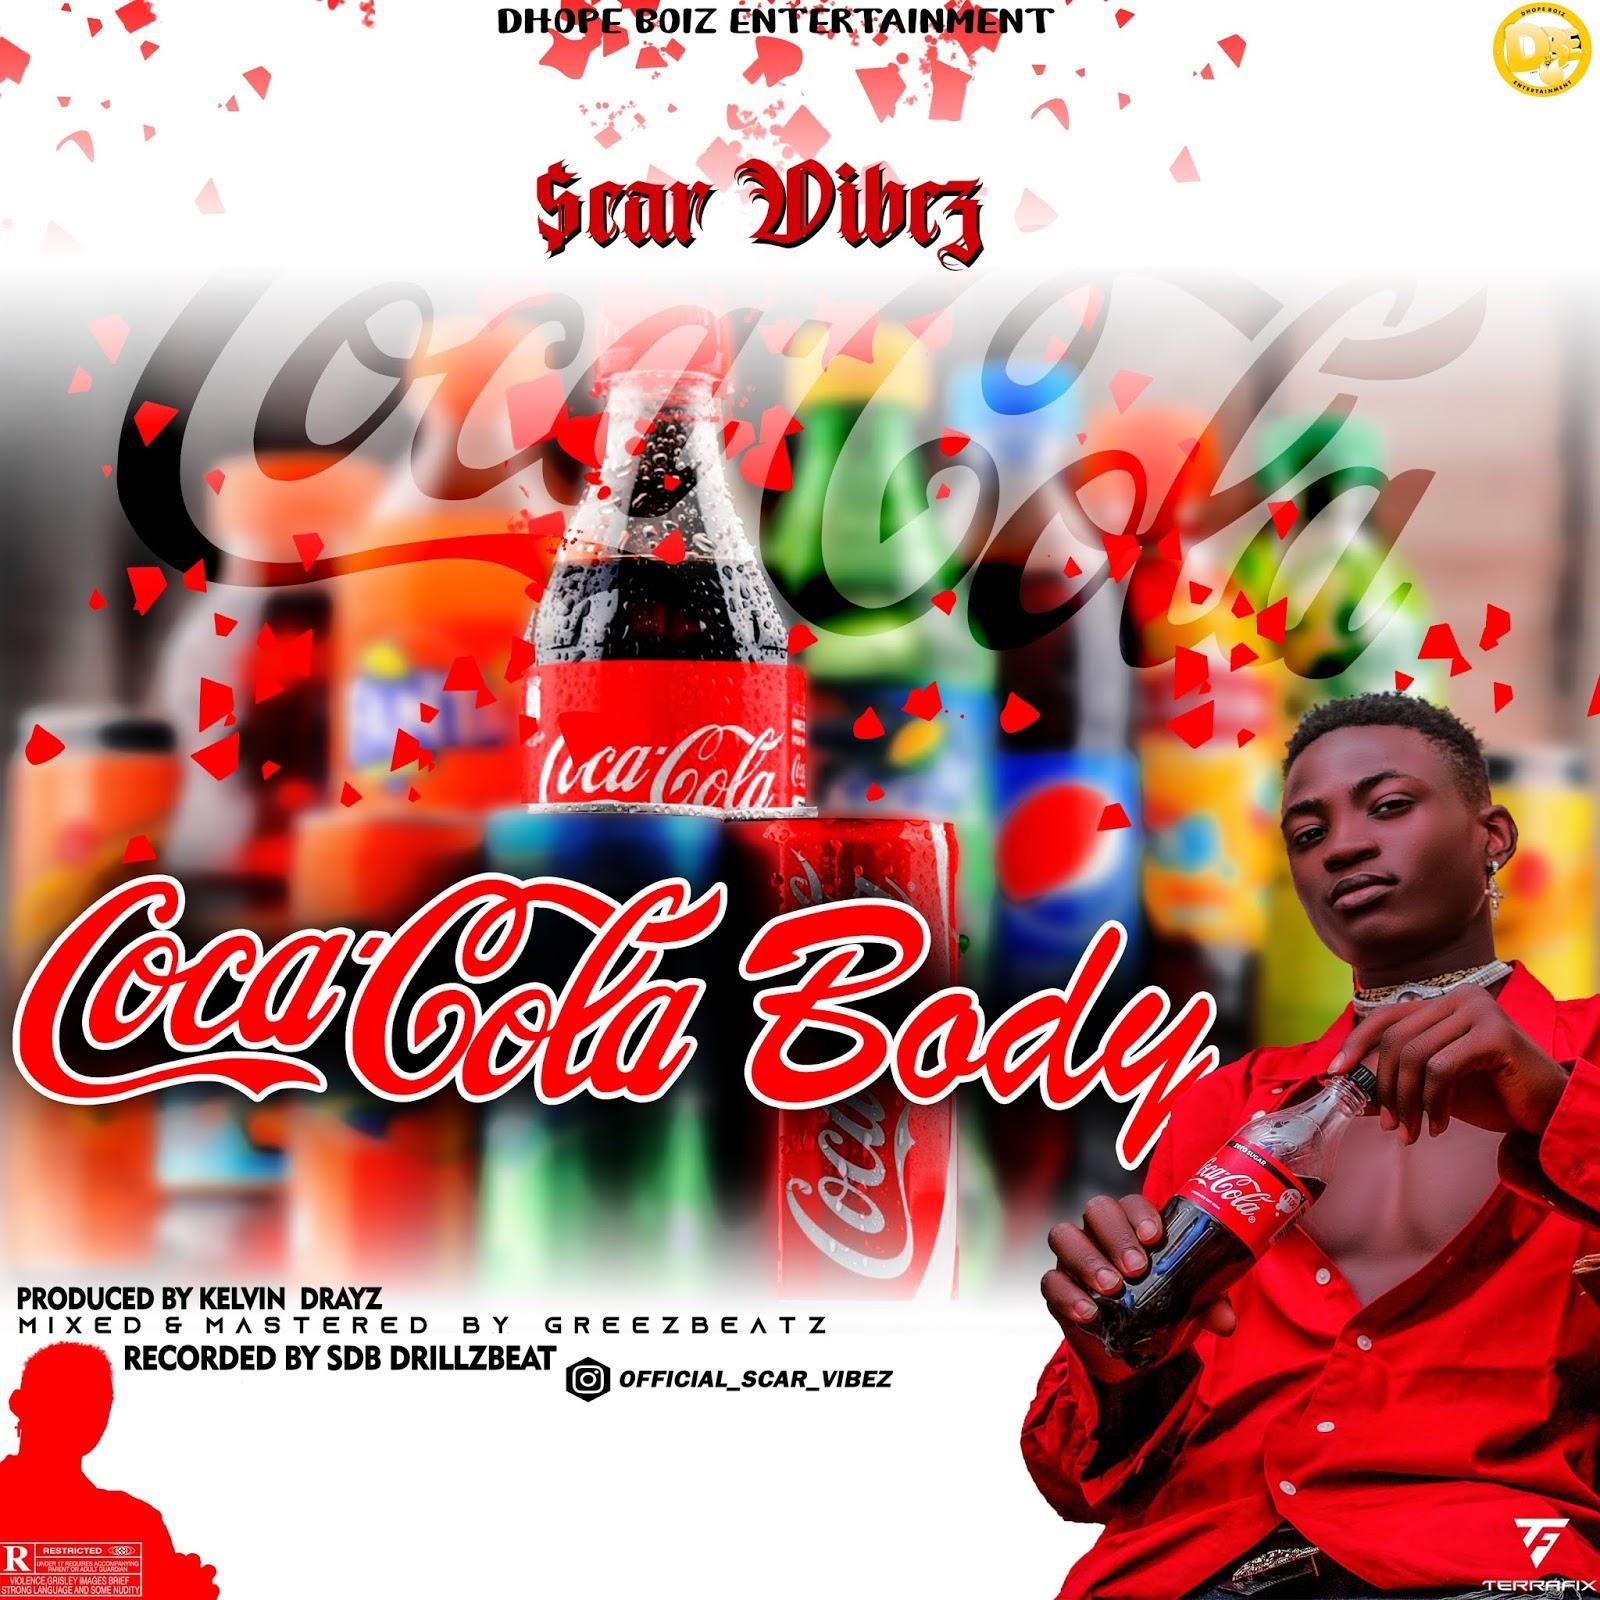 [Music] Scar Vibez - Coca_Cola Body (M&M by Greezbeatz) #Pryme9jablog